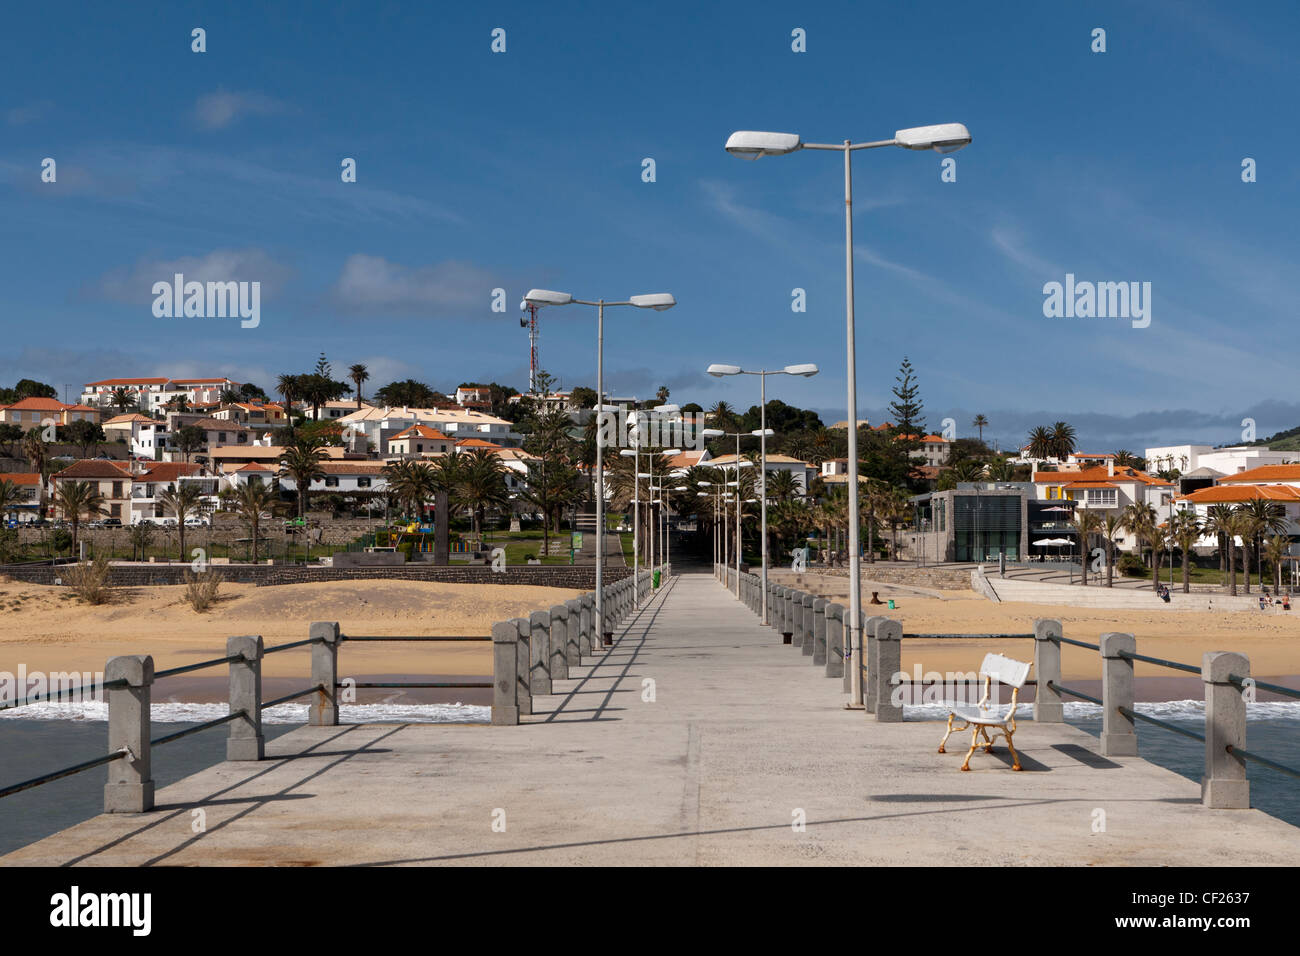 Vila Baleira, Porto Santo, Portugal - Stock Image